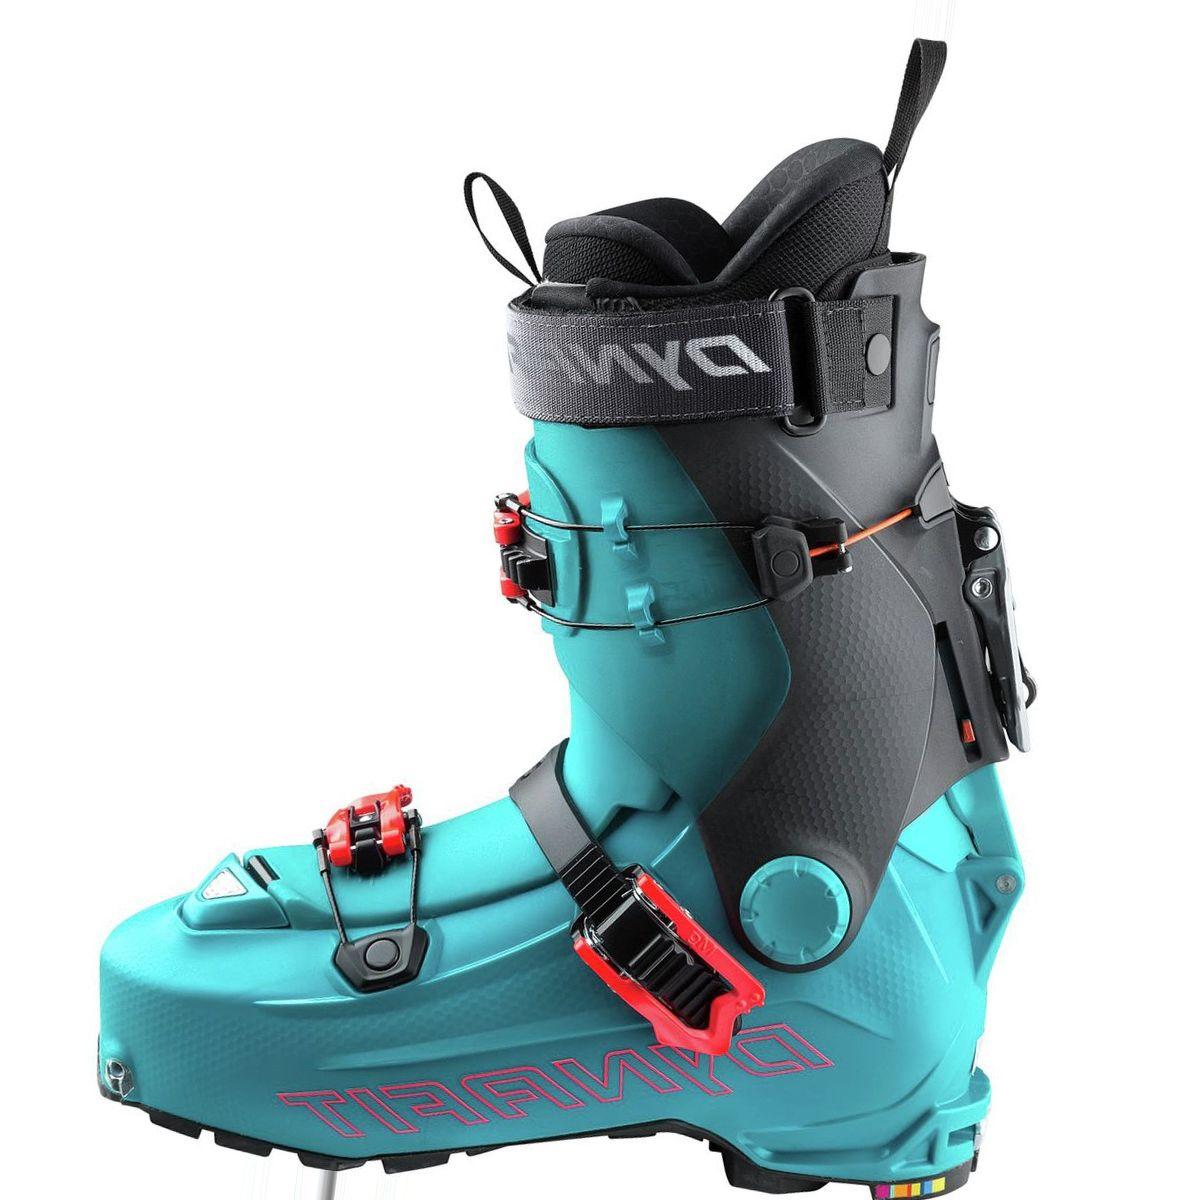 Dynafit Hoji PX Ski Boot - Women's